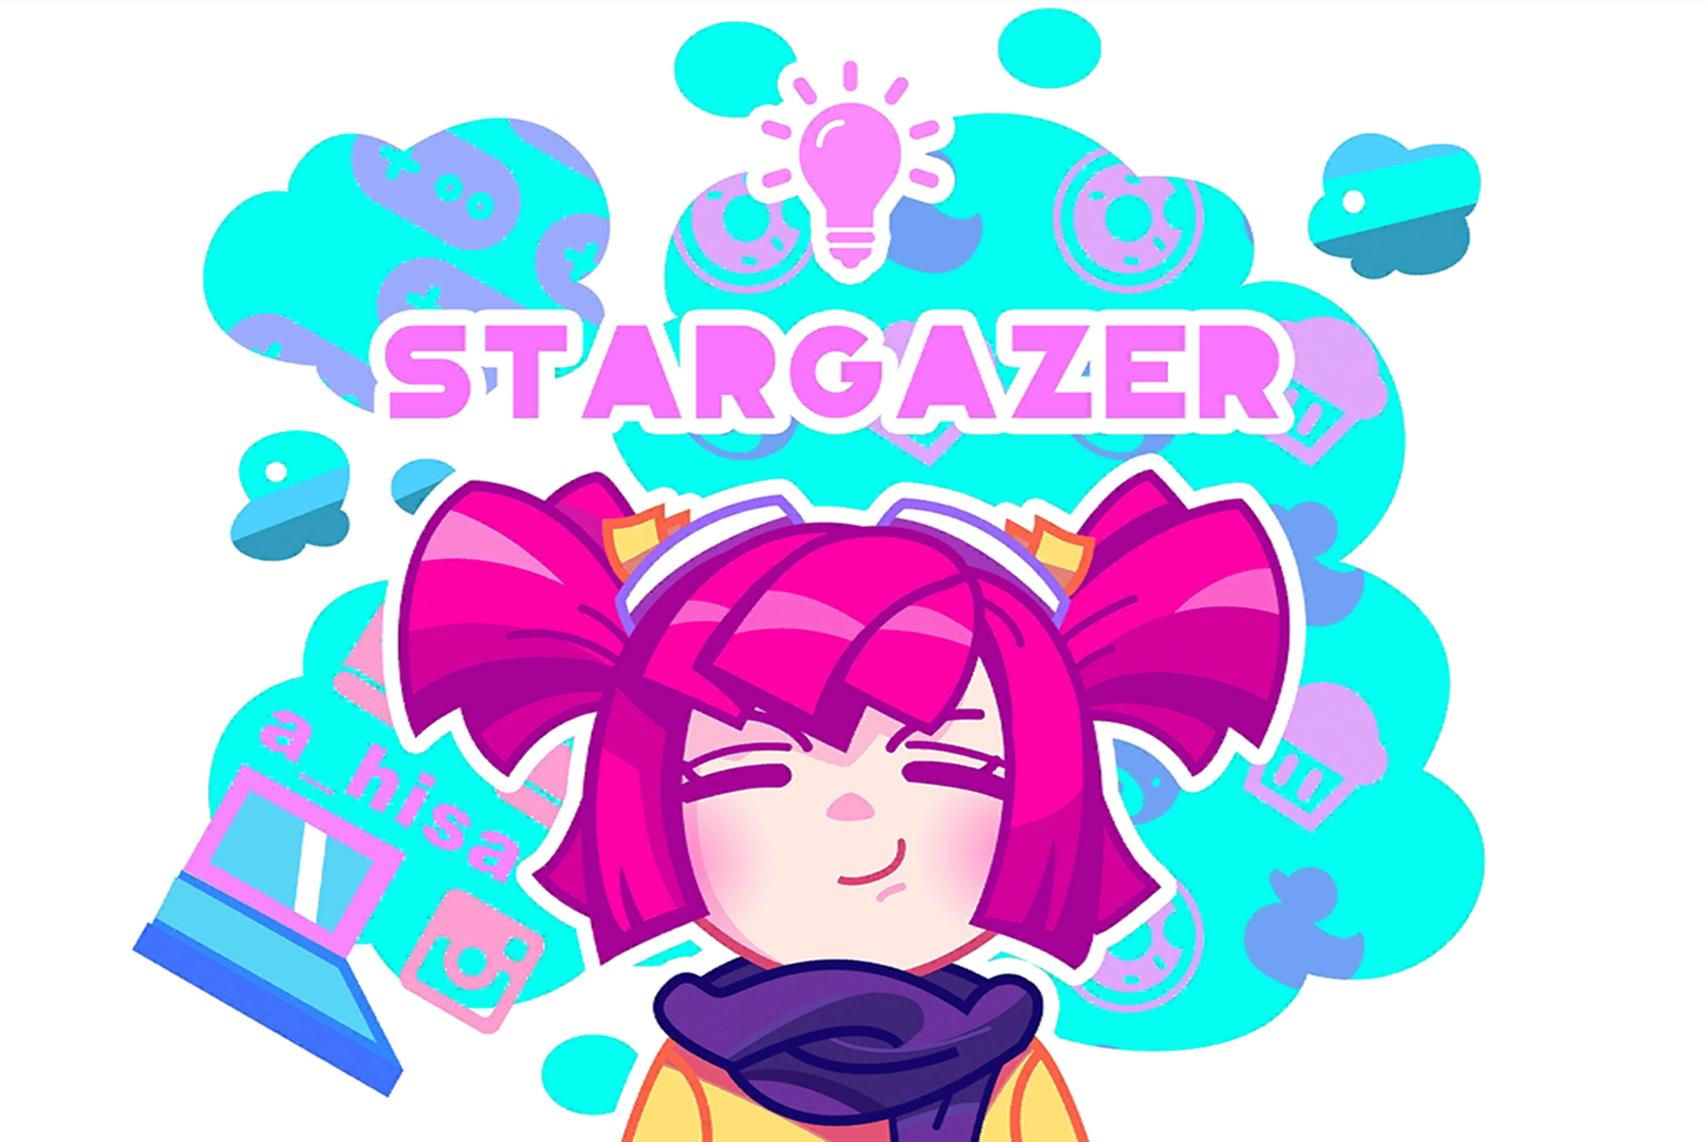 Stargazer.png